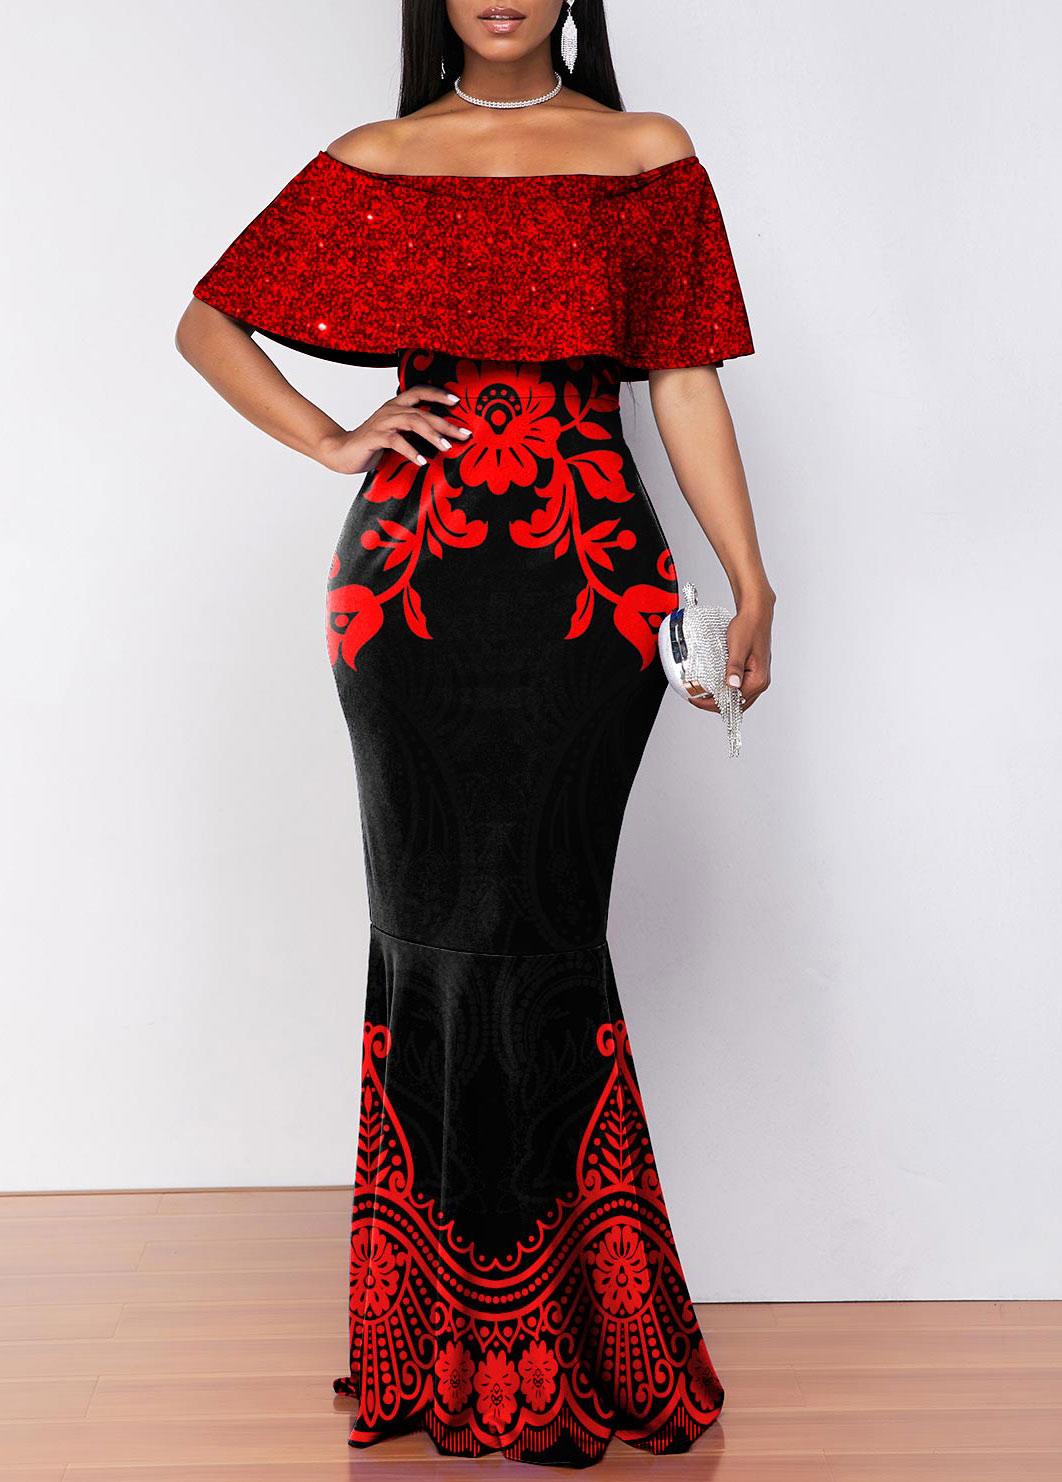 Sequin Overlay Floral Print Off Shoulder Mermaid Dress